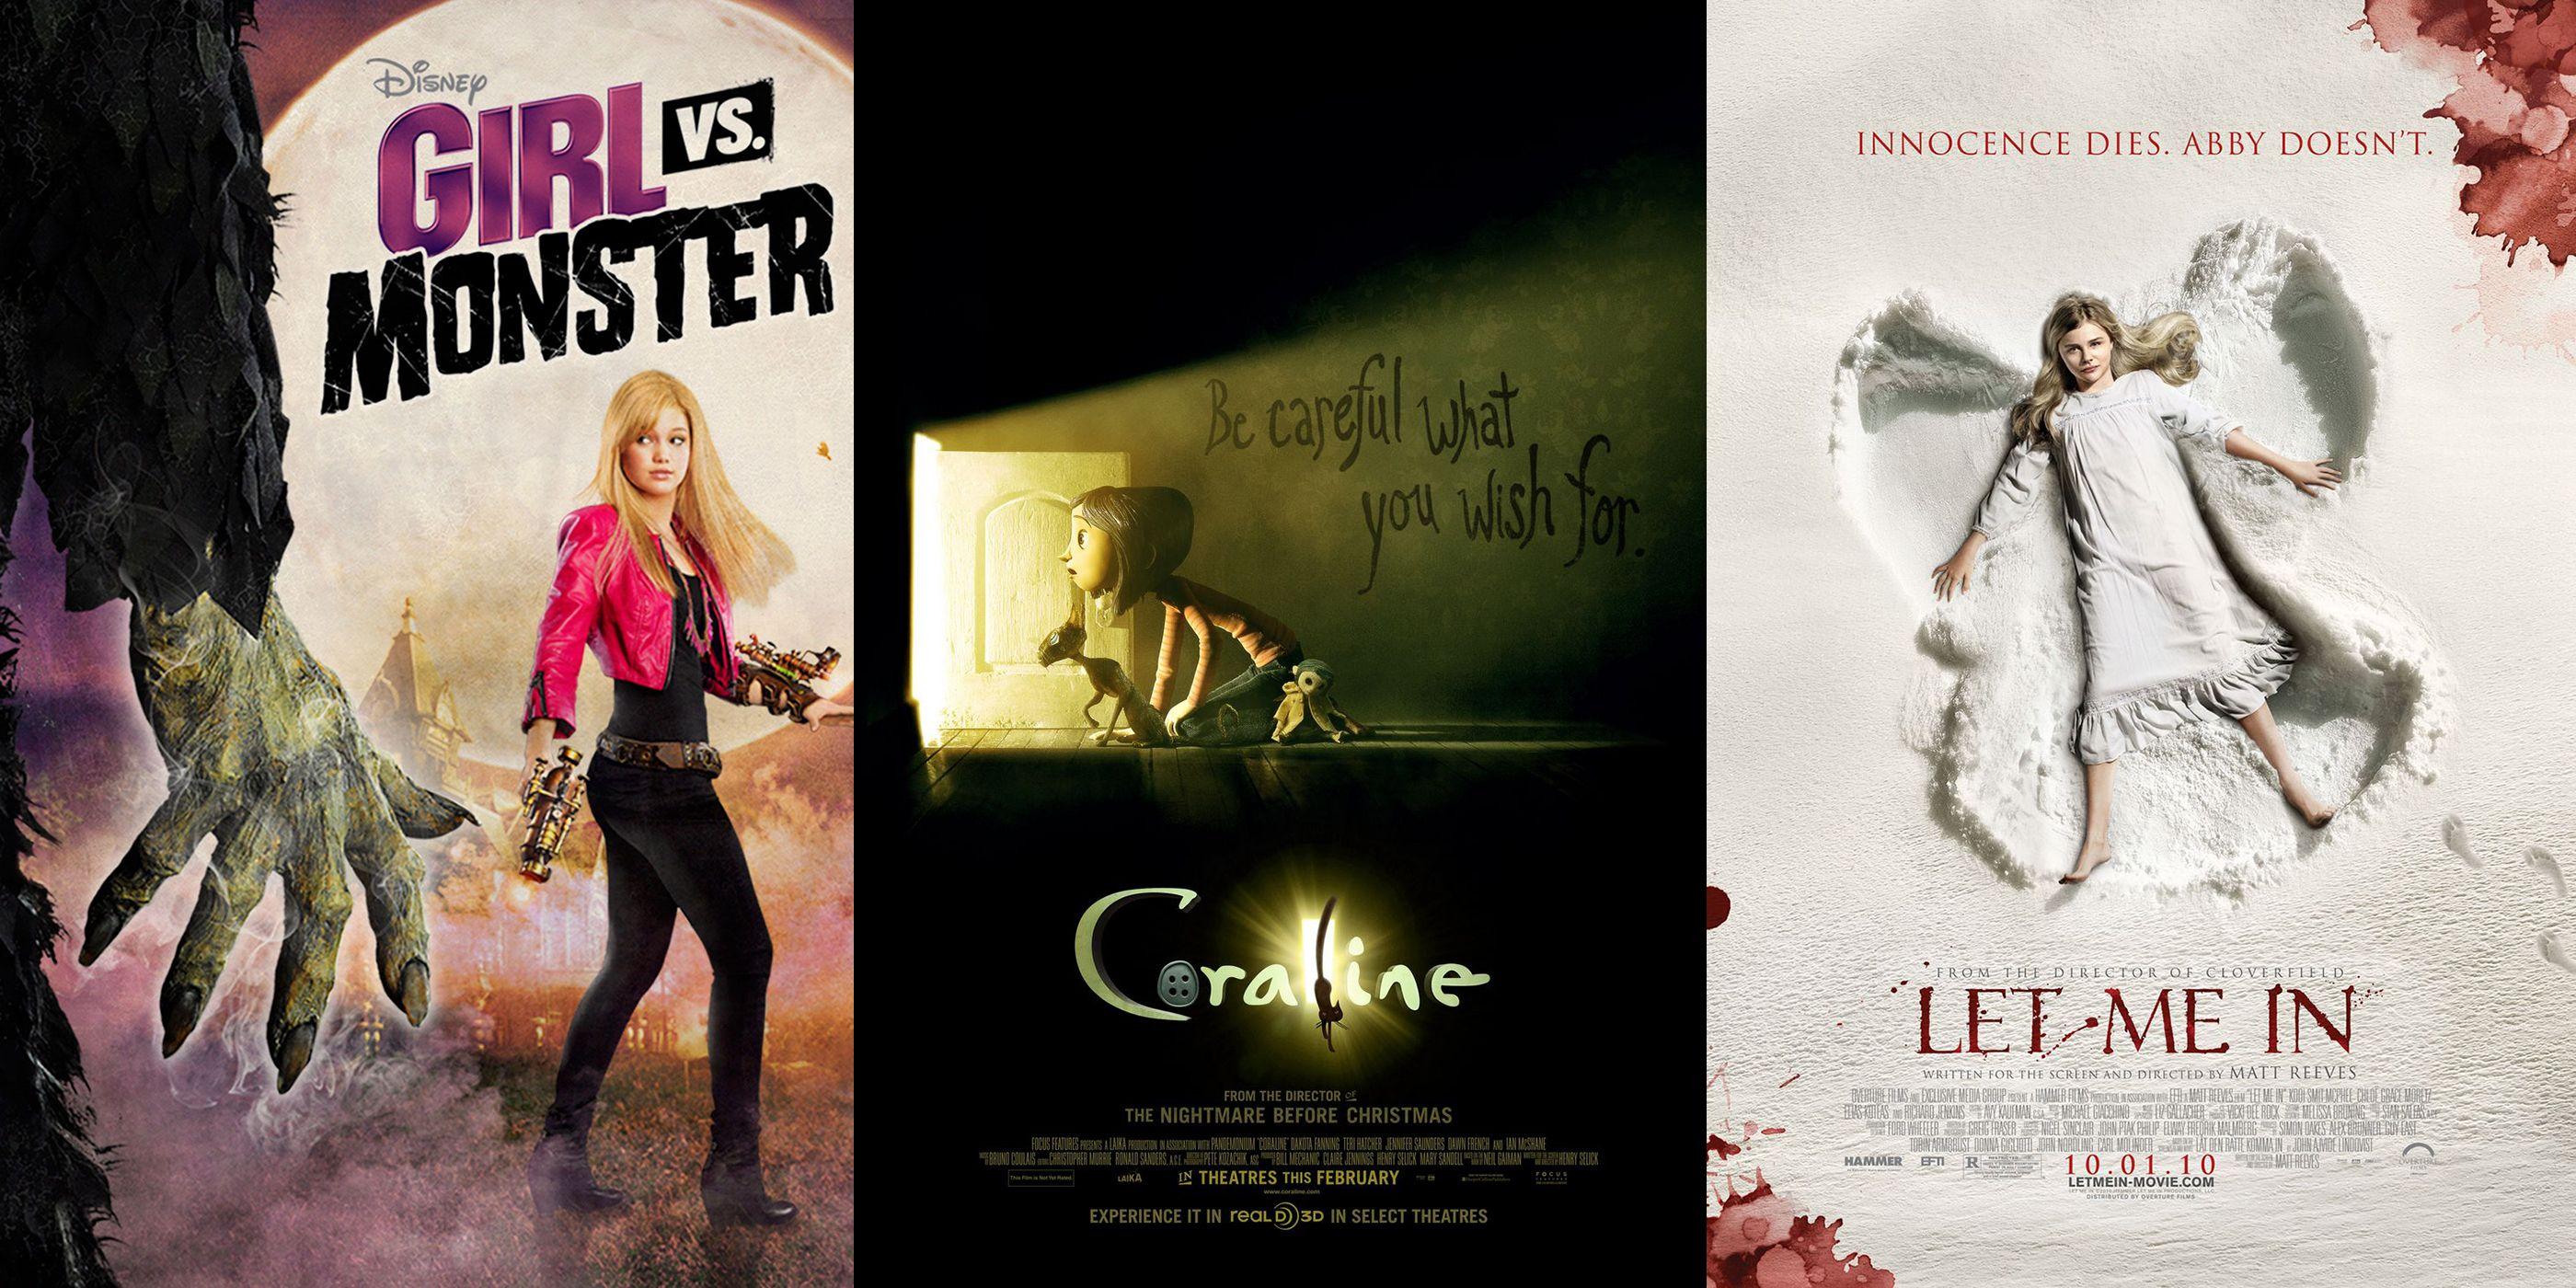 12 Best Halloween Movies On Netflix 2018 - Netflix Scary Movies